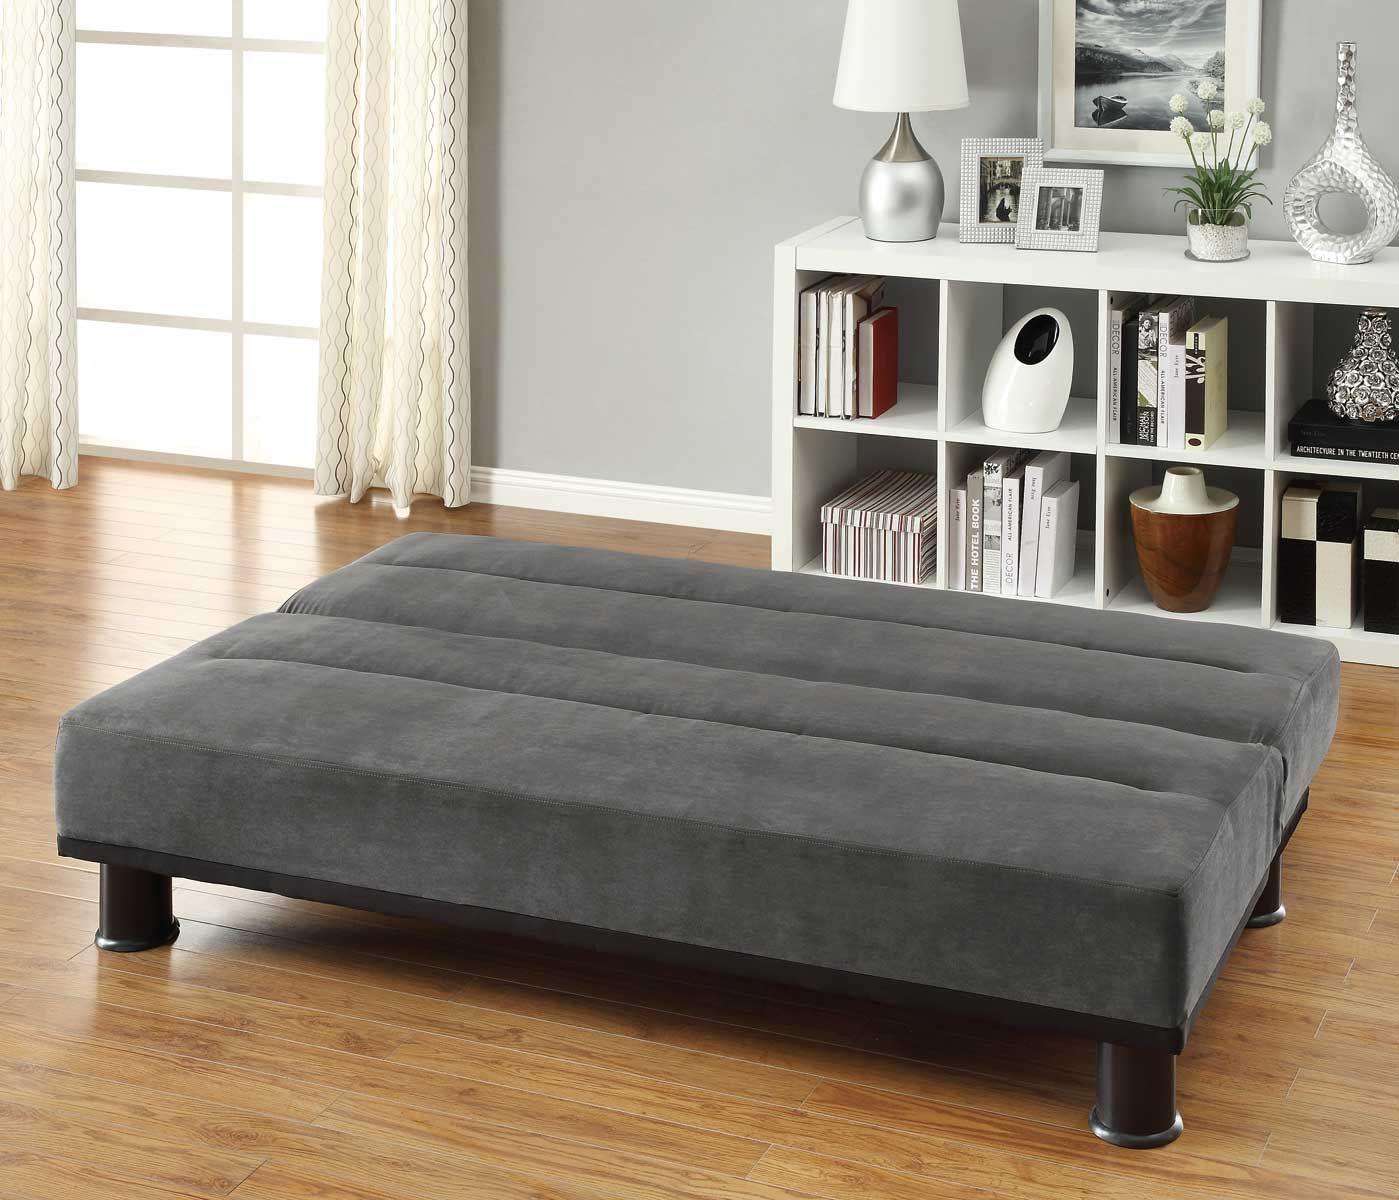 Homelegance Callie ClickClack Sofa Bed Graphite Grey